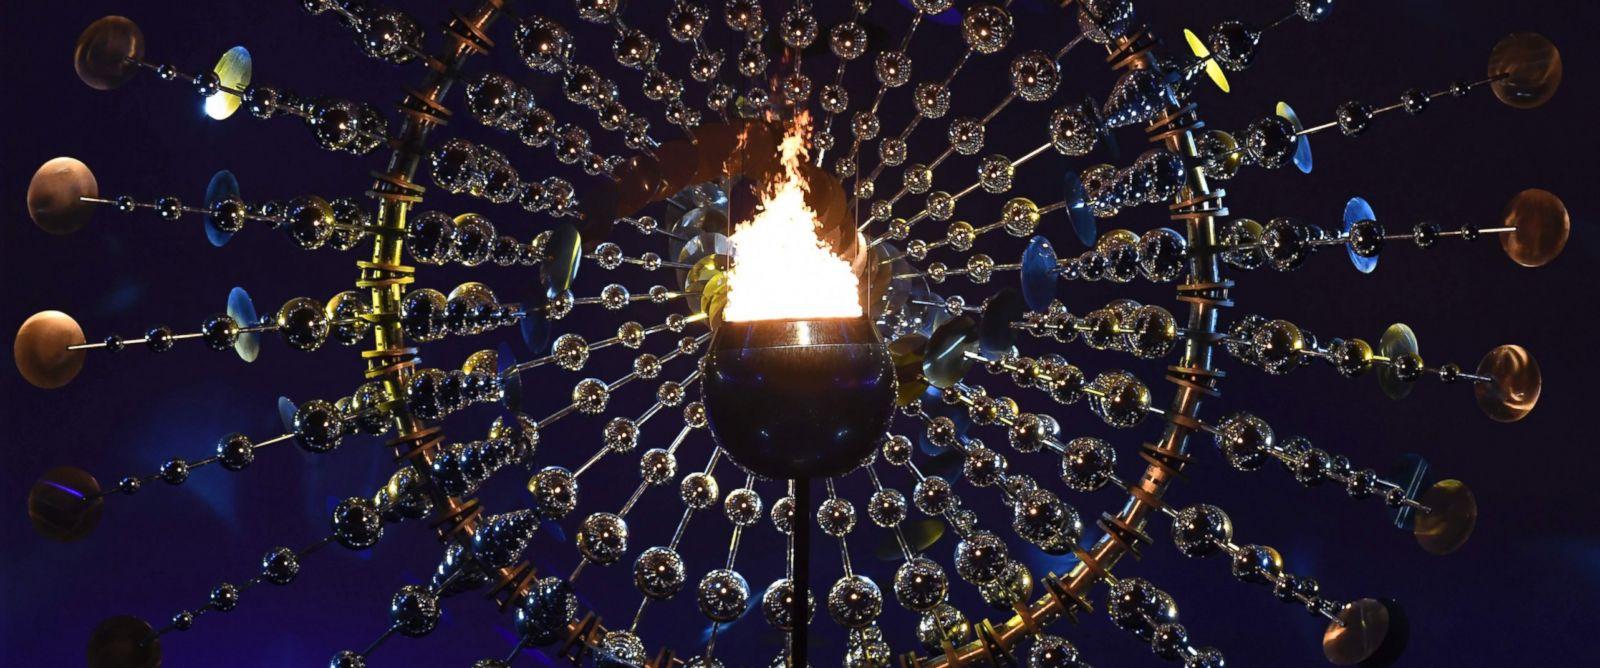 GTY_olympics_opening_ceremony_1_jt_16080